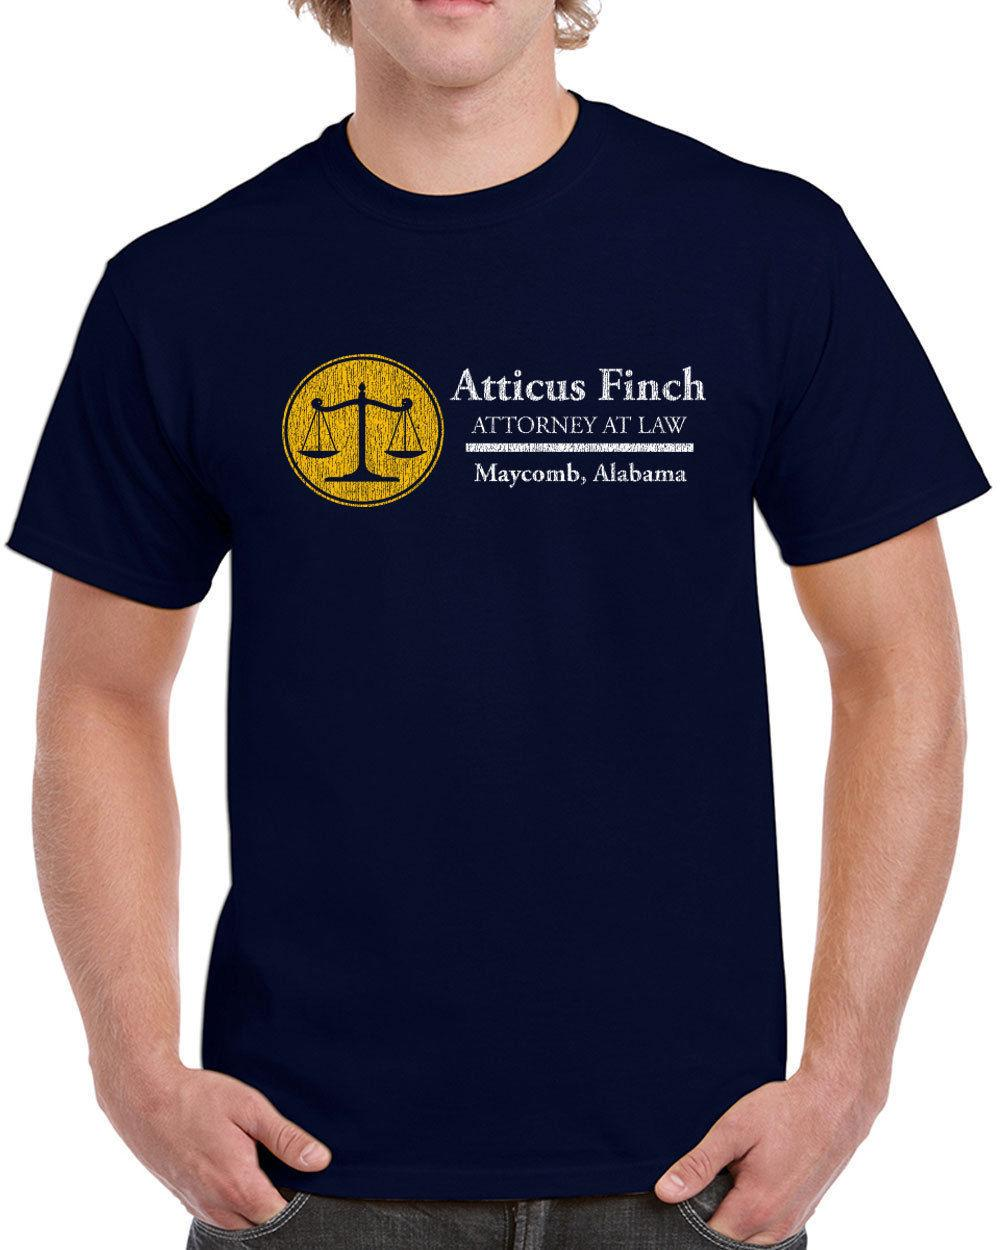 Company T Shirt Designs Ideas - DREAMWORKS